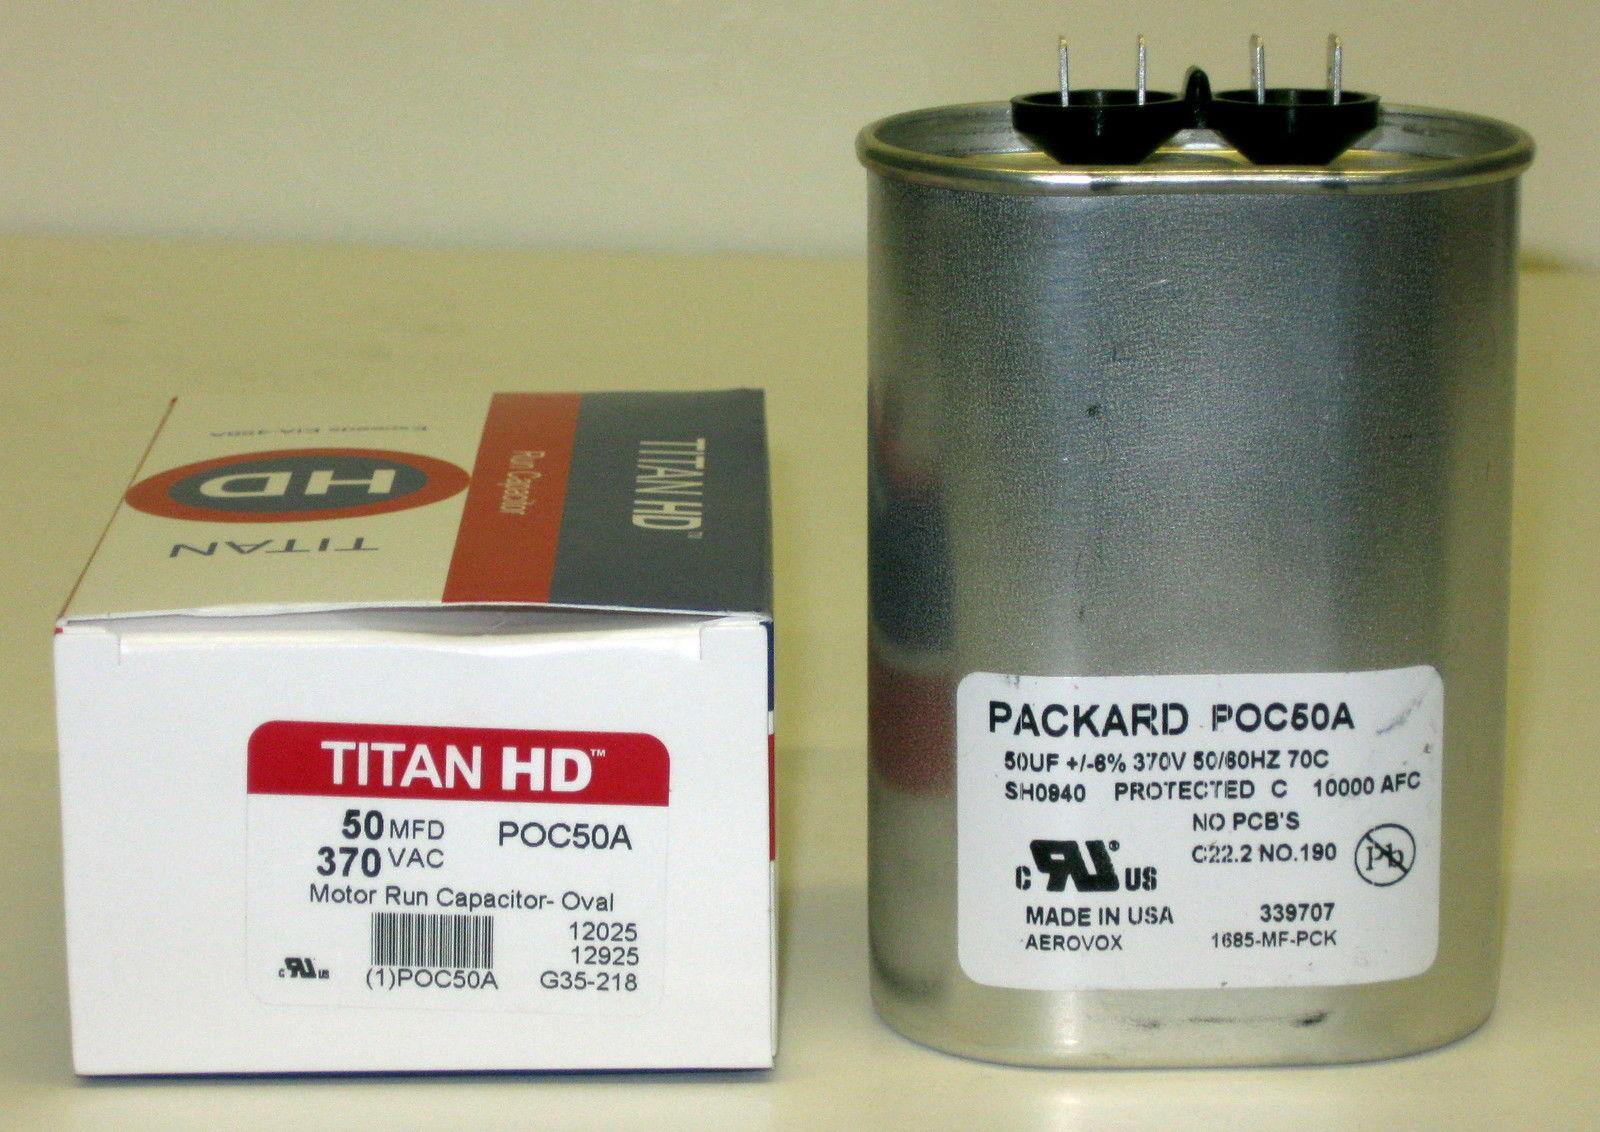 Aerovox Replacement Titan Hd Run Capacitor 50 Mfd 370V Oval 1685-MF-PCK By Titan